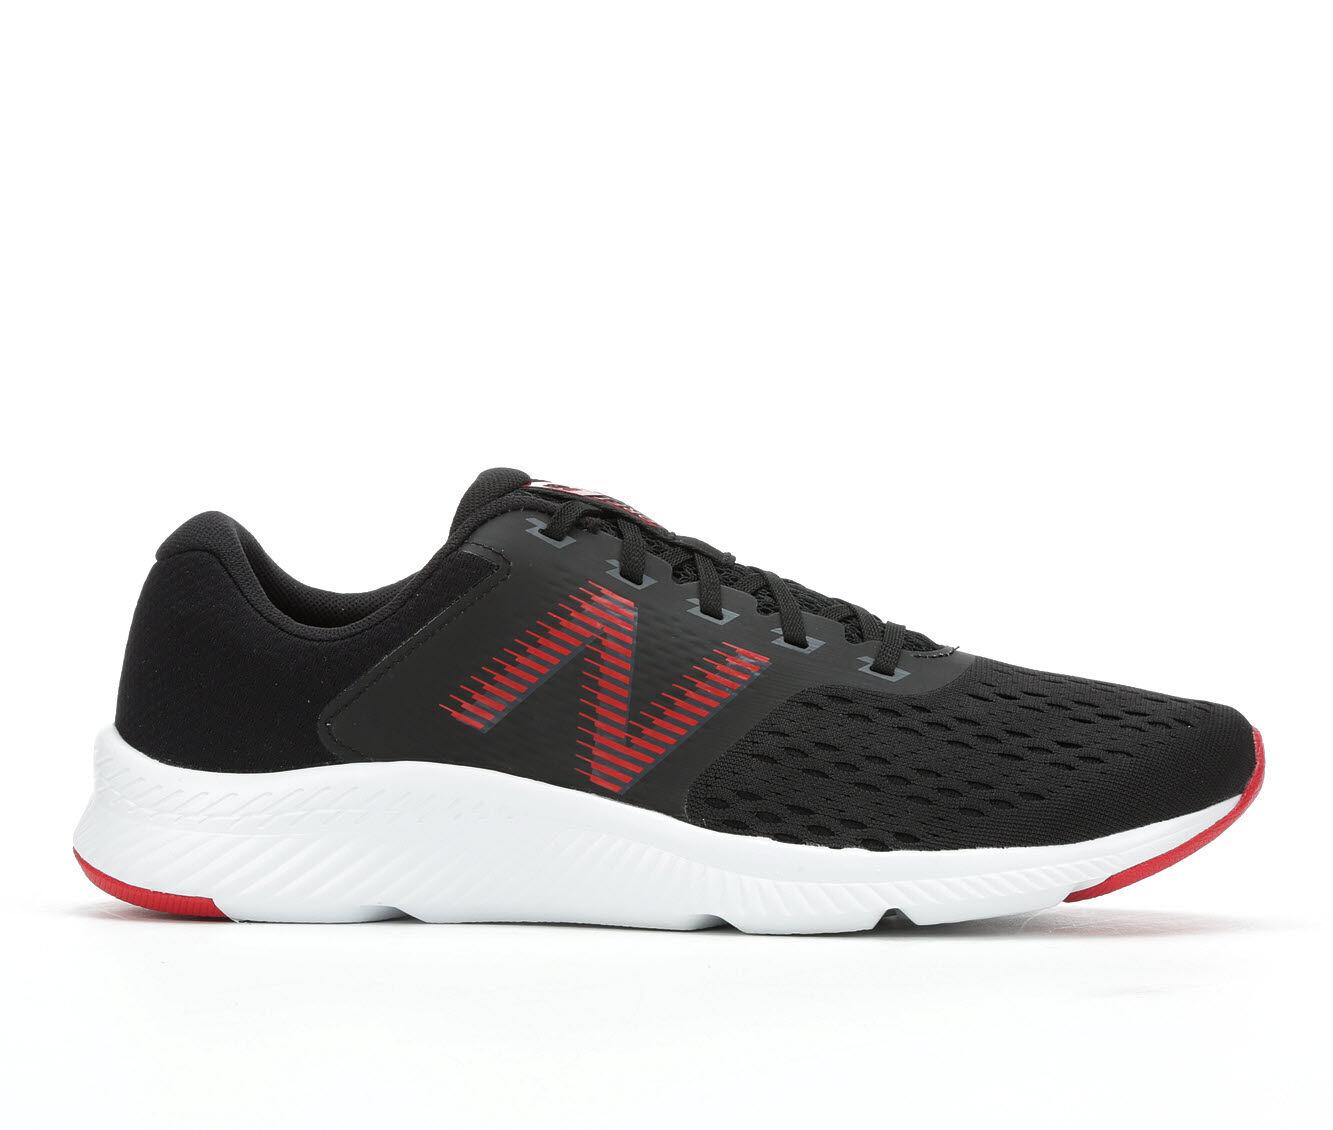 Men's New Balance Draft Running Shoes